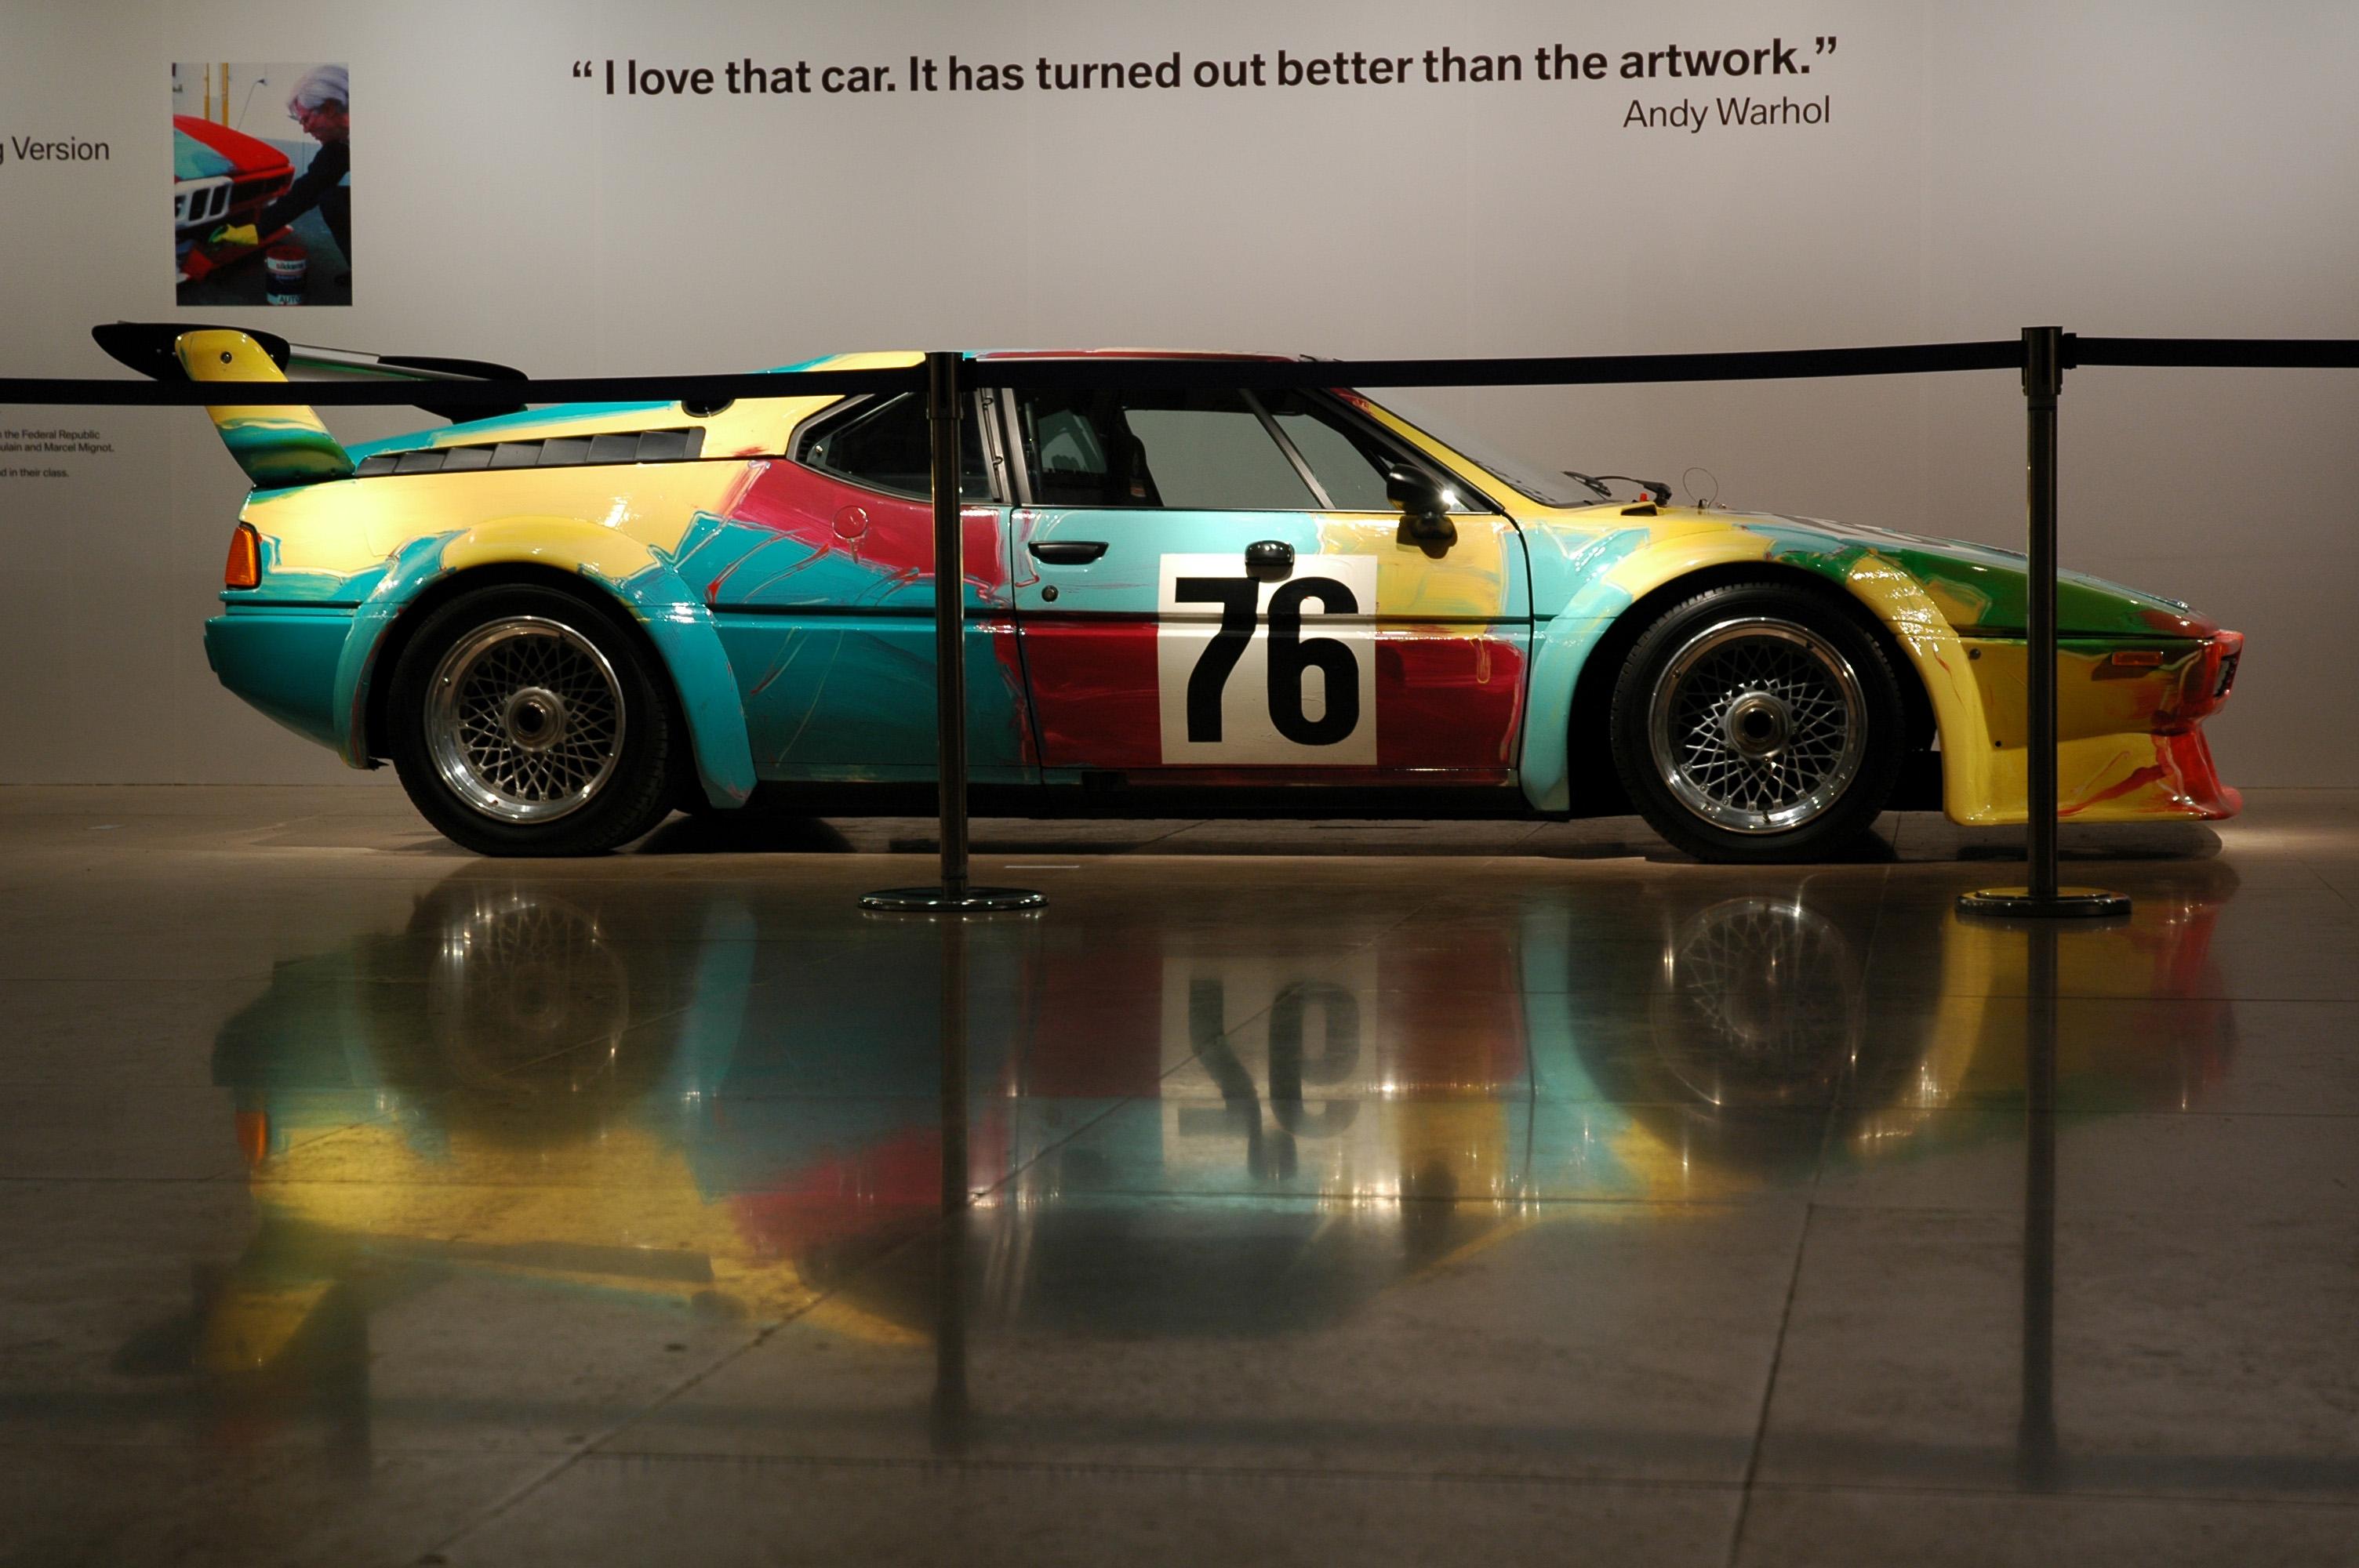 File:BMW M1 Art Car.jpg - Wikimedia Commons